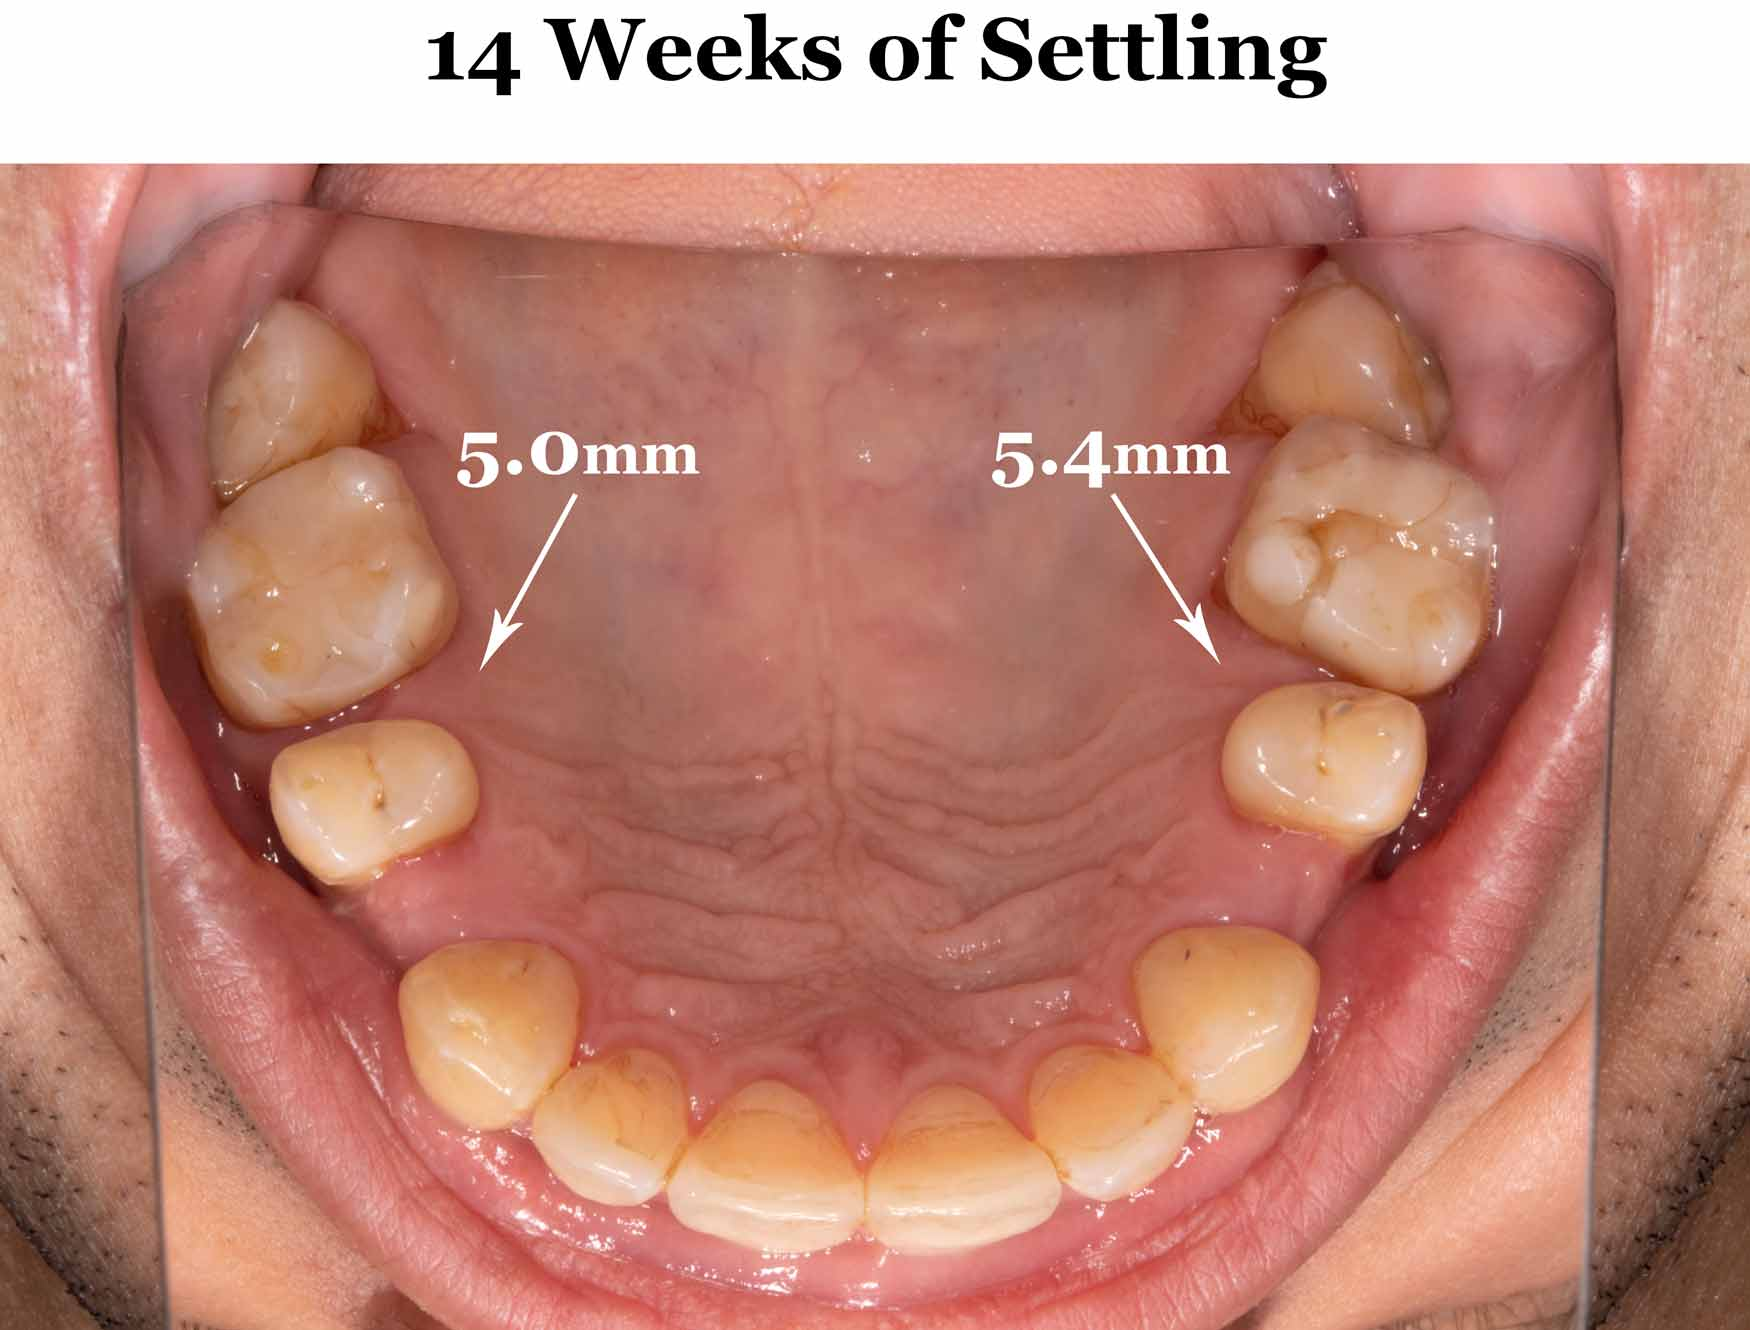 14-weeks-settling_upper-straight-down.jpg